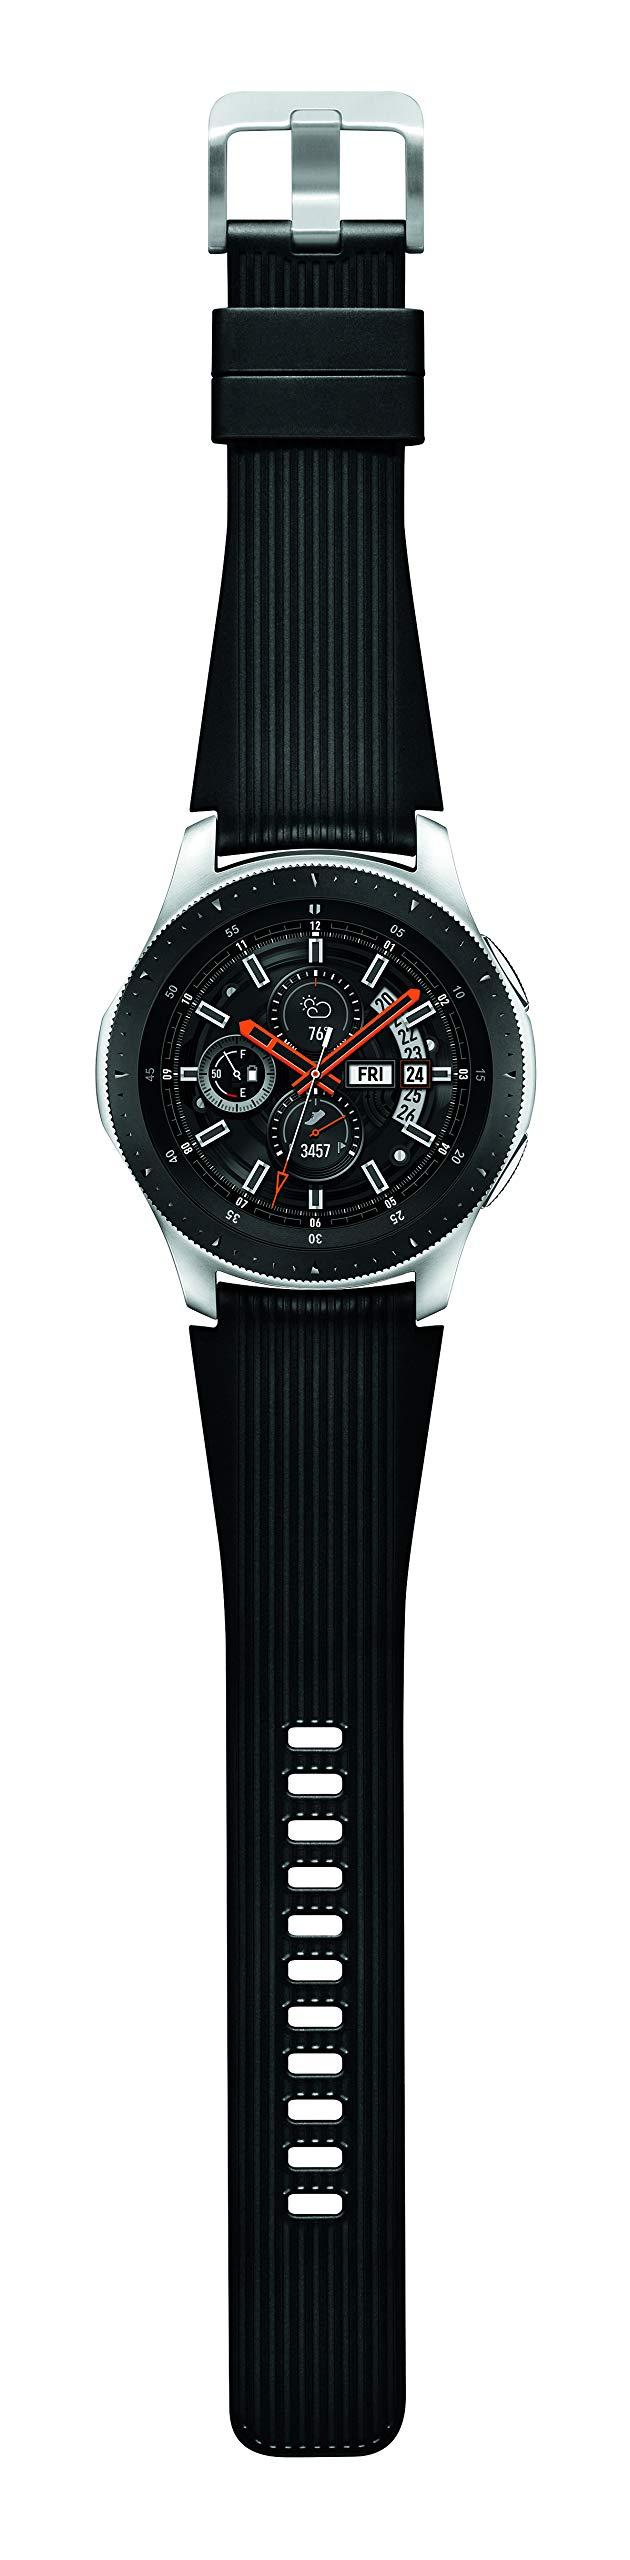 Samsung Galaxy Smartwatch (46mm) Silver (Bluetooth), SM-R800NZSAXAR - US Version with Warranty by Samsung (Image #5)